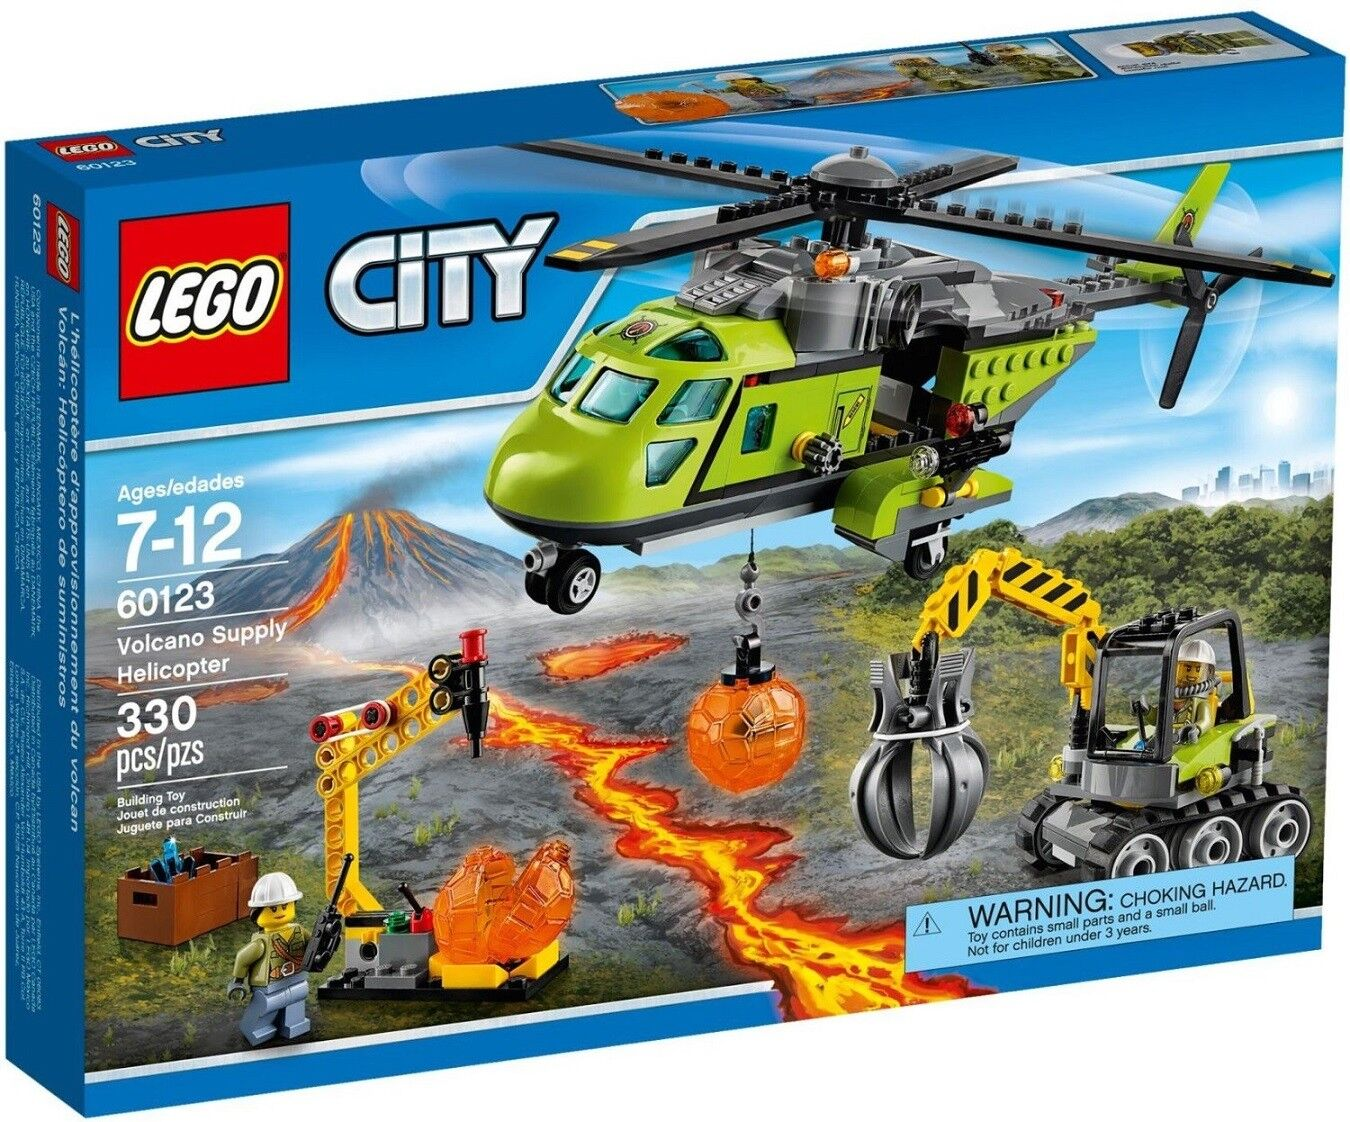 Lego - City - 60123 - HELICÓPTERO Del Volcán